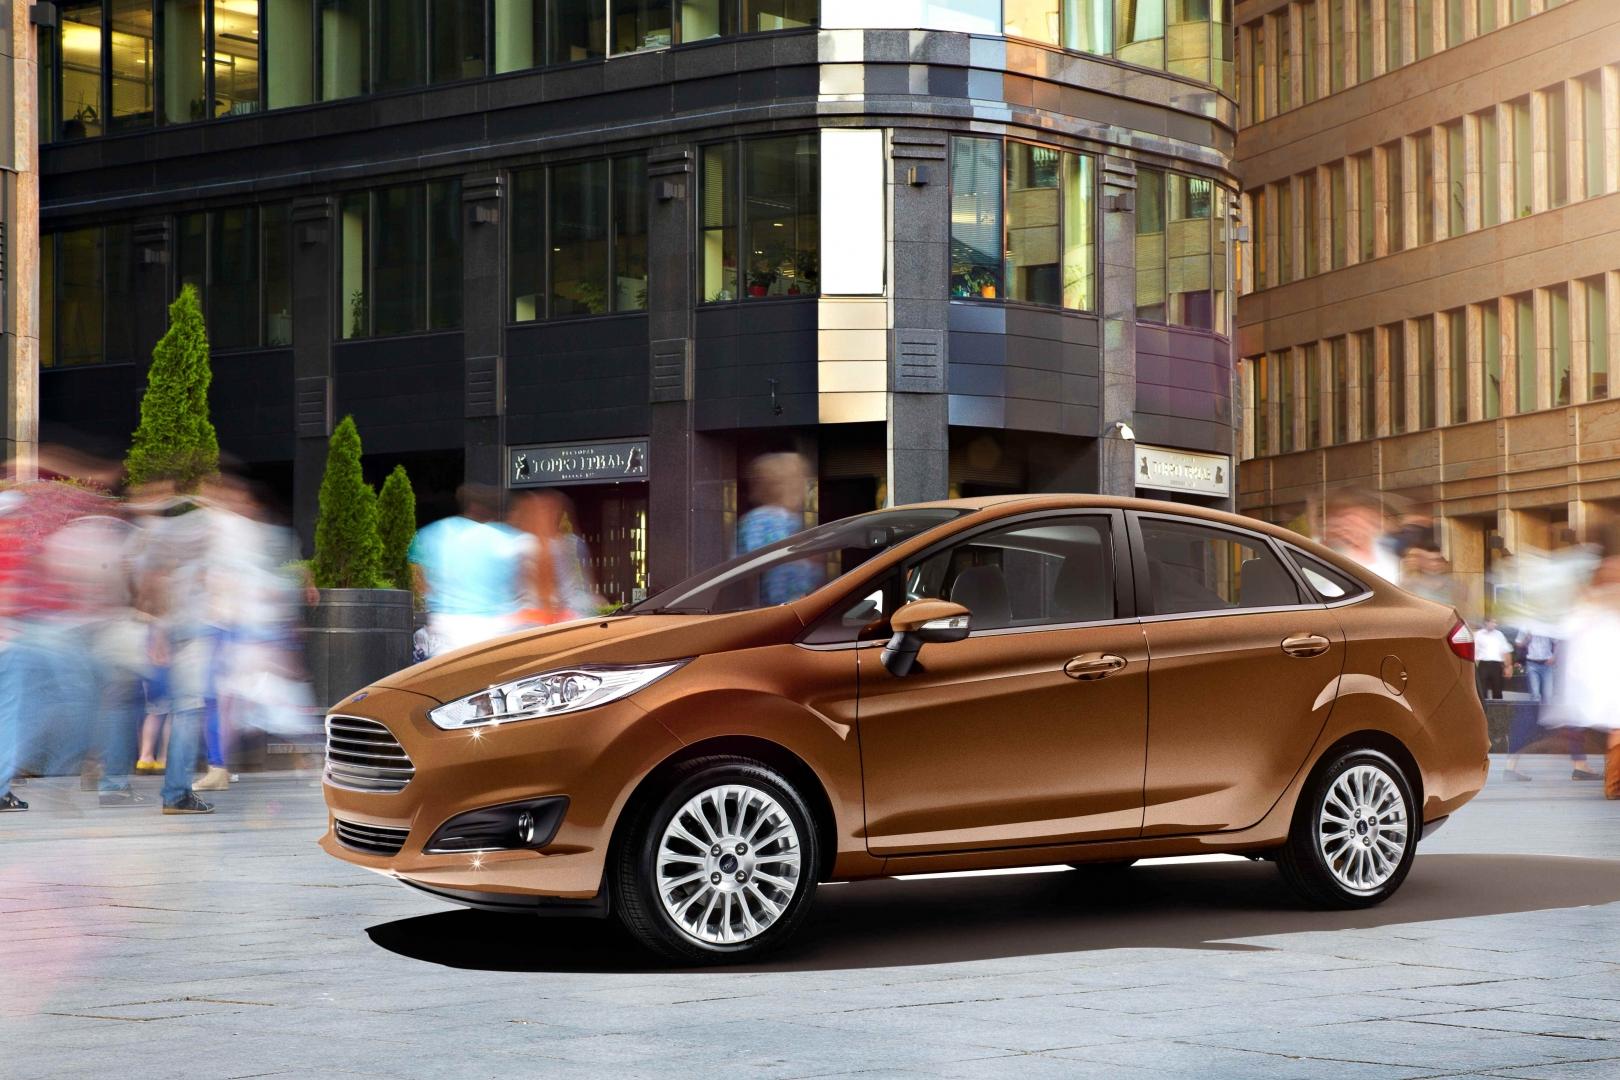 Ford Sollers продлевает действие программы утилизации!